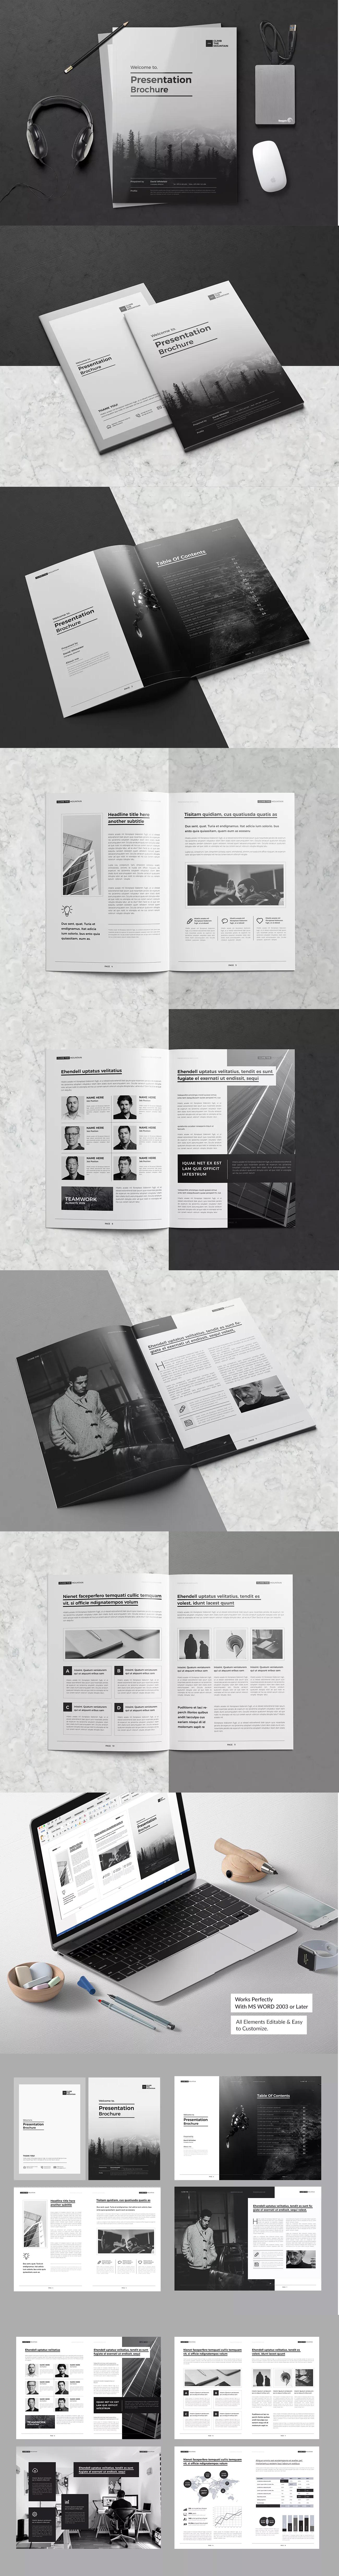 Presentation Brochure Template InDesign INDD A4 | Brochure Templates ...